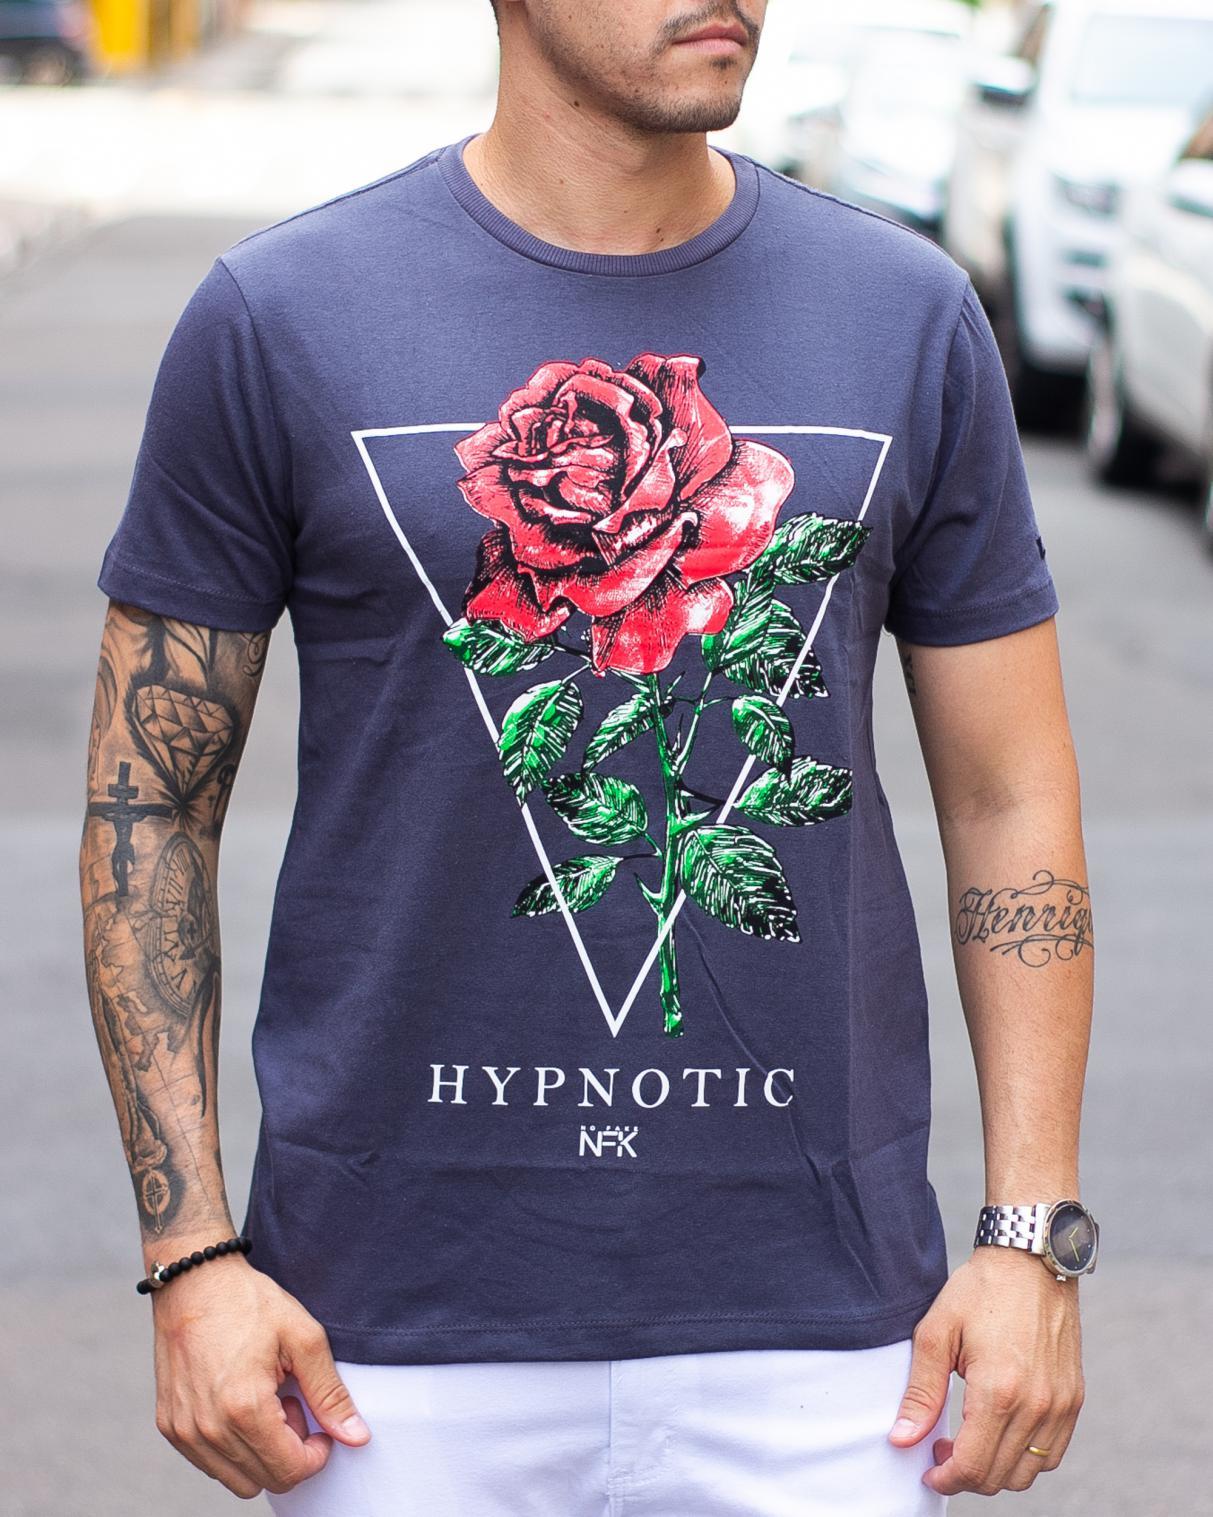 CAMISETA NOFAKE HYPNOTIC